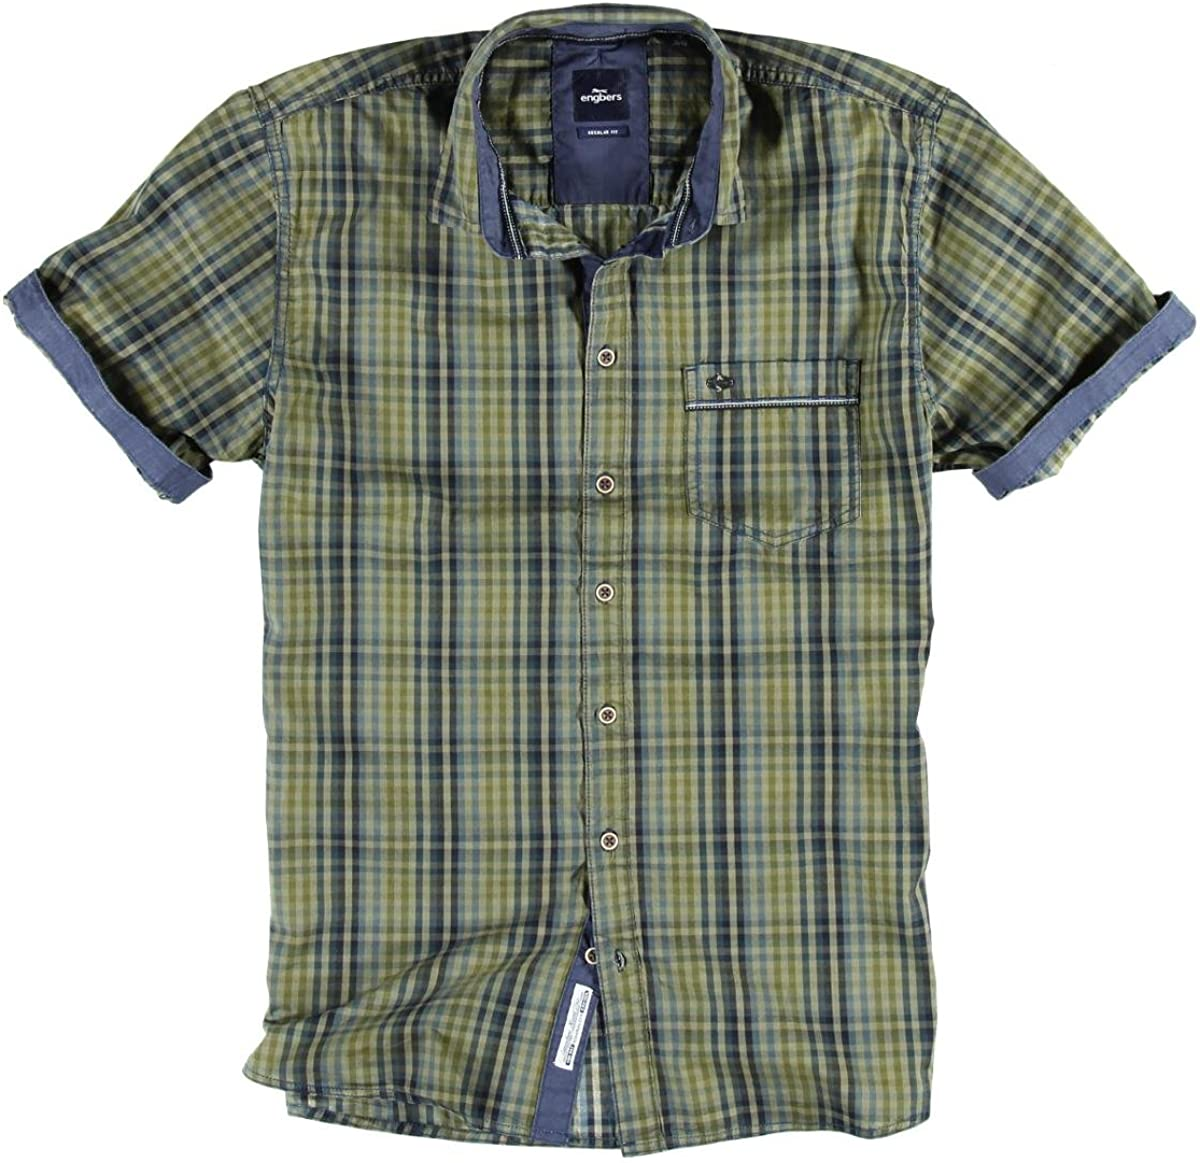 engbers Hombre Camisa Cuadros, Caravana, color verde ...